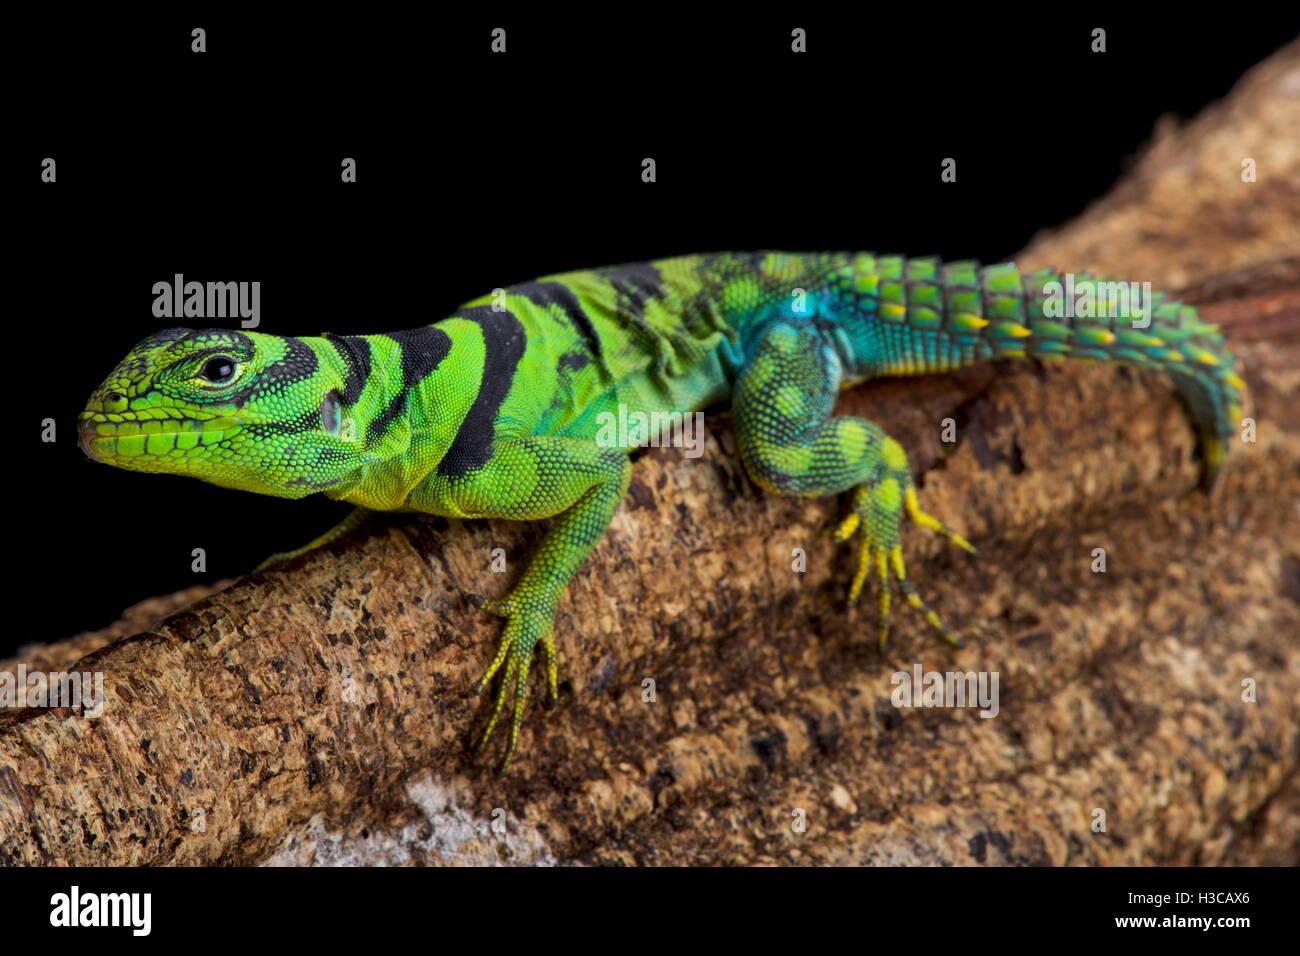 Iguane vert thornytail, Uracentron azureum, Suriname Photo Stock